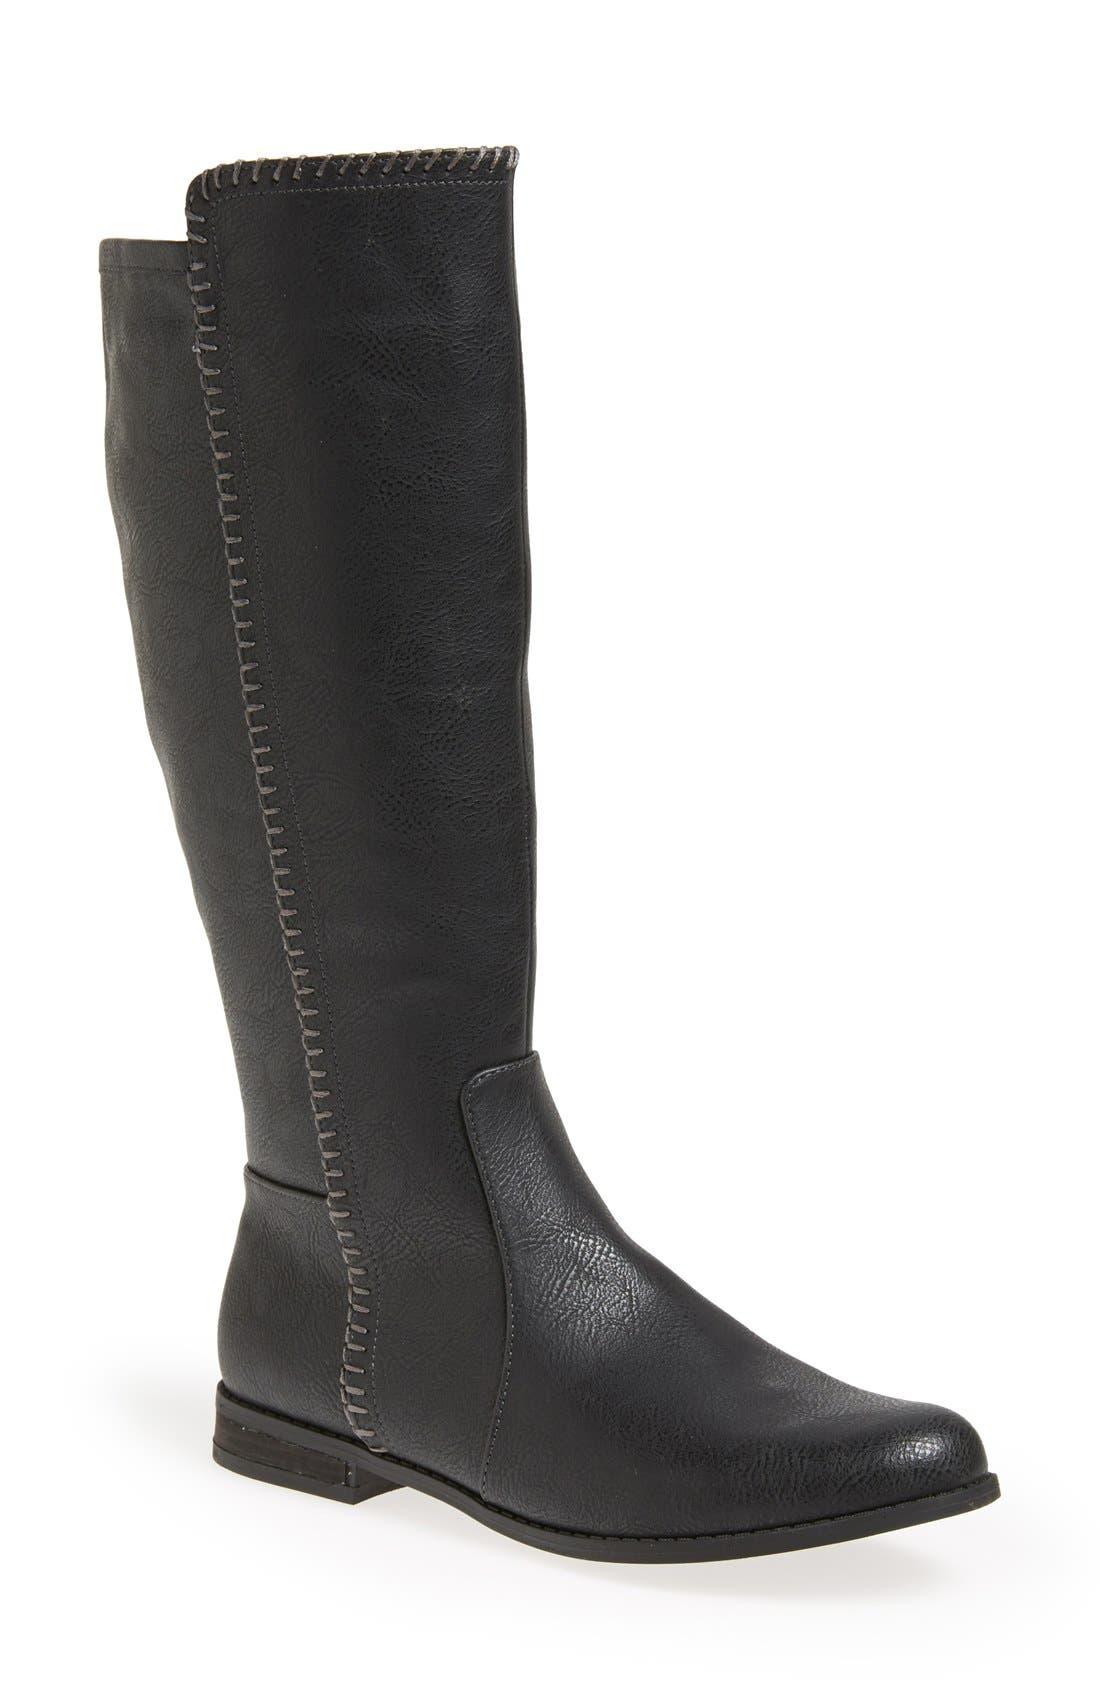 Main Image - Dr. Scholl's 'Confess' Riding Boot (Women) (Wide Calf)